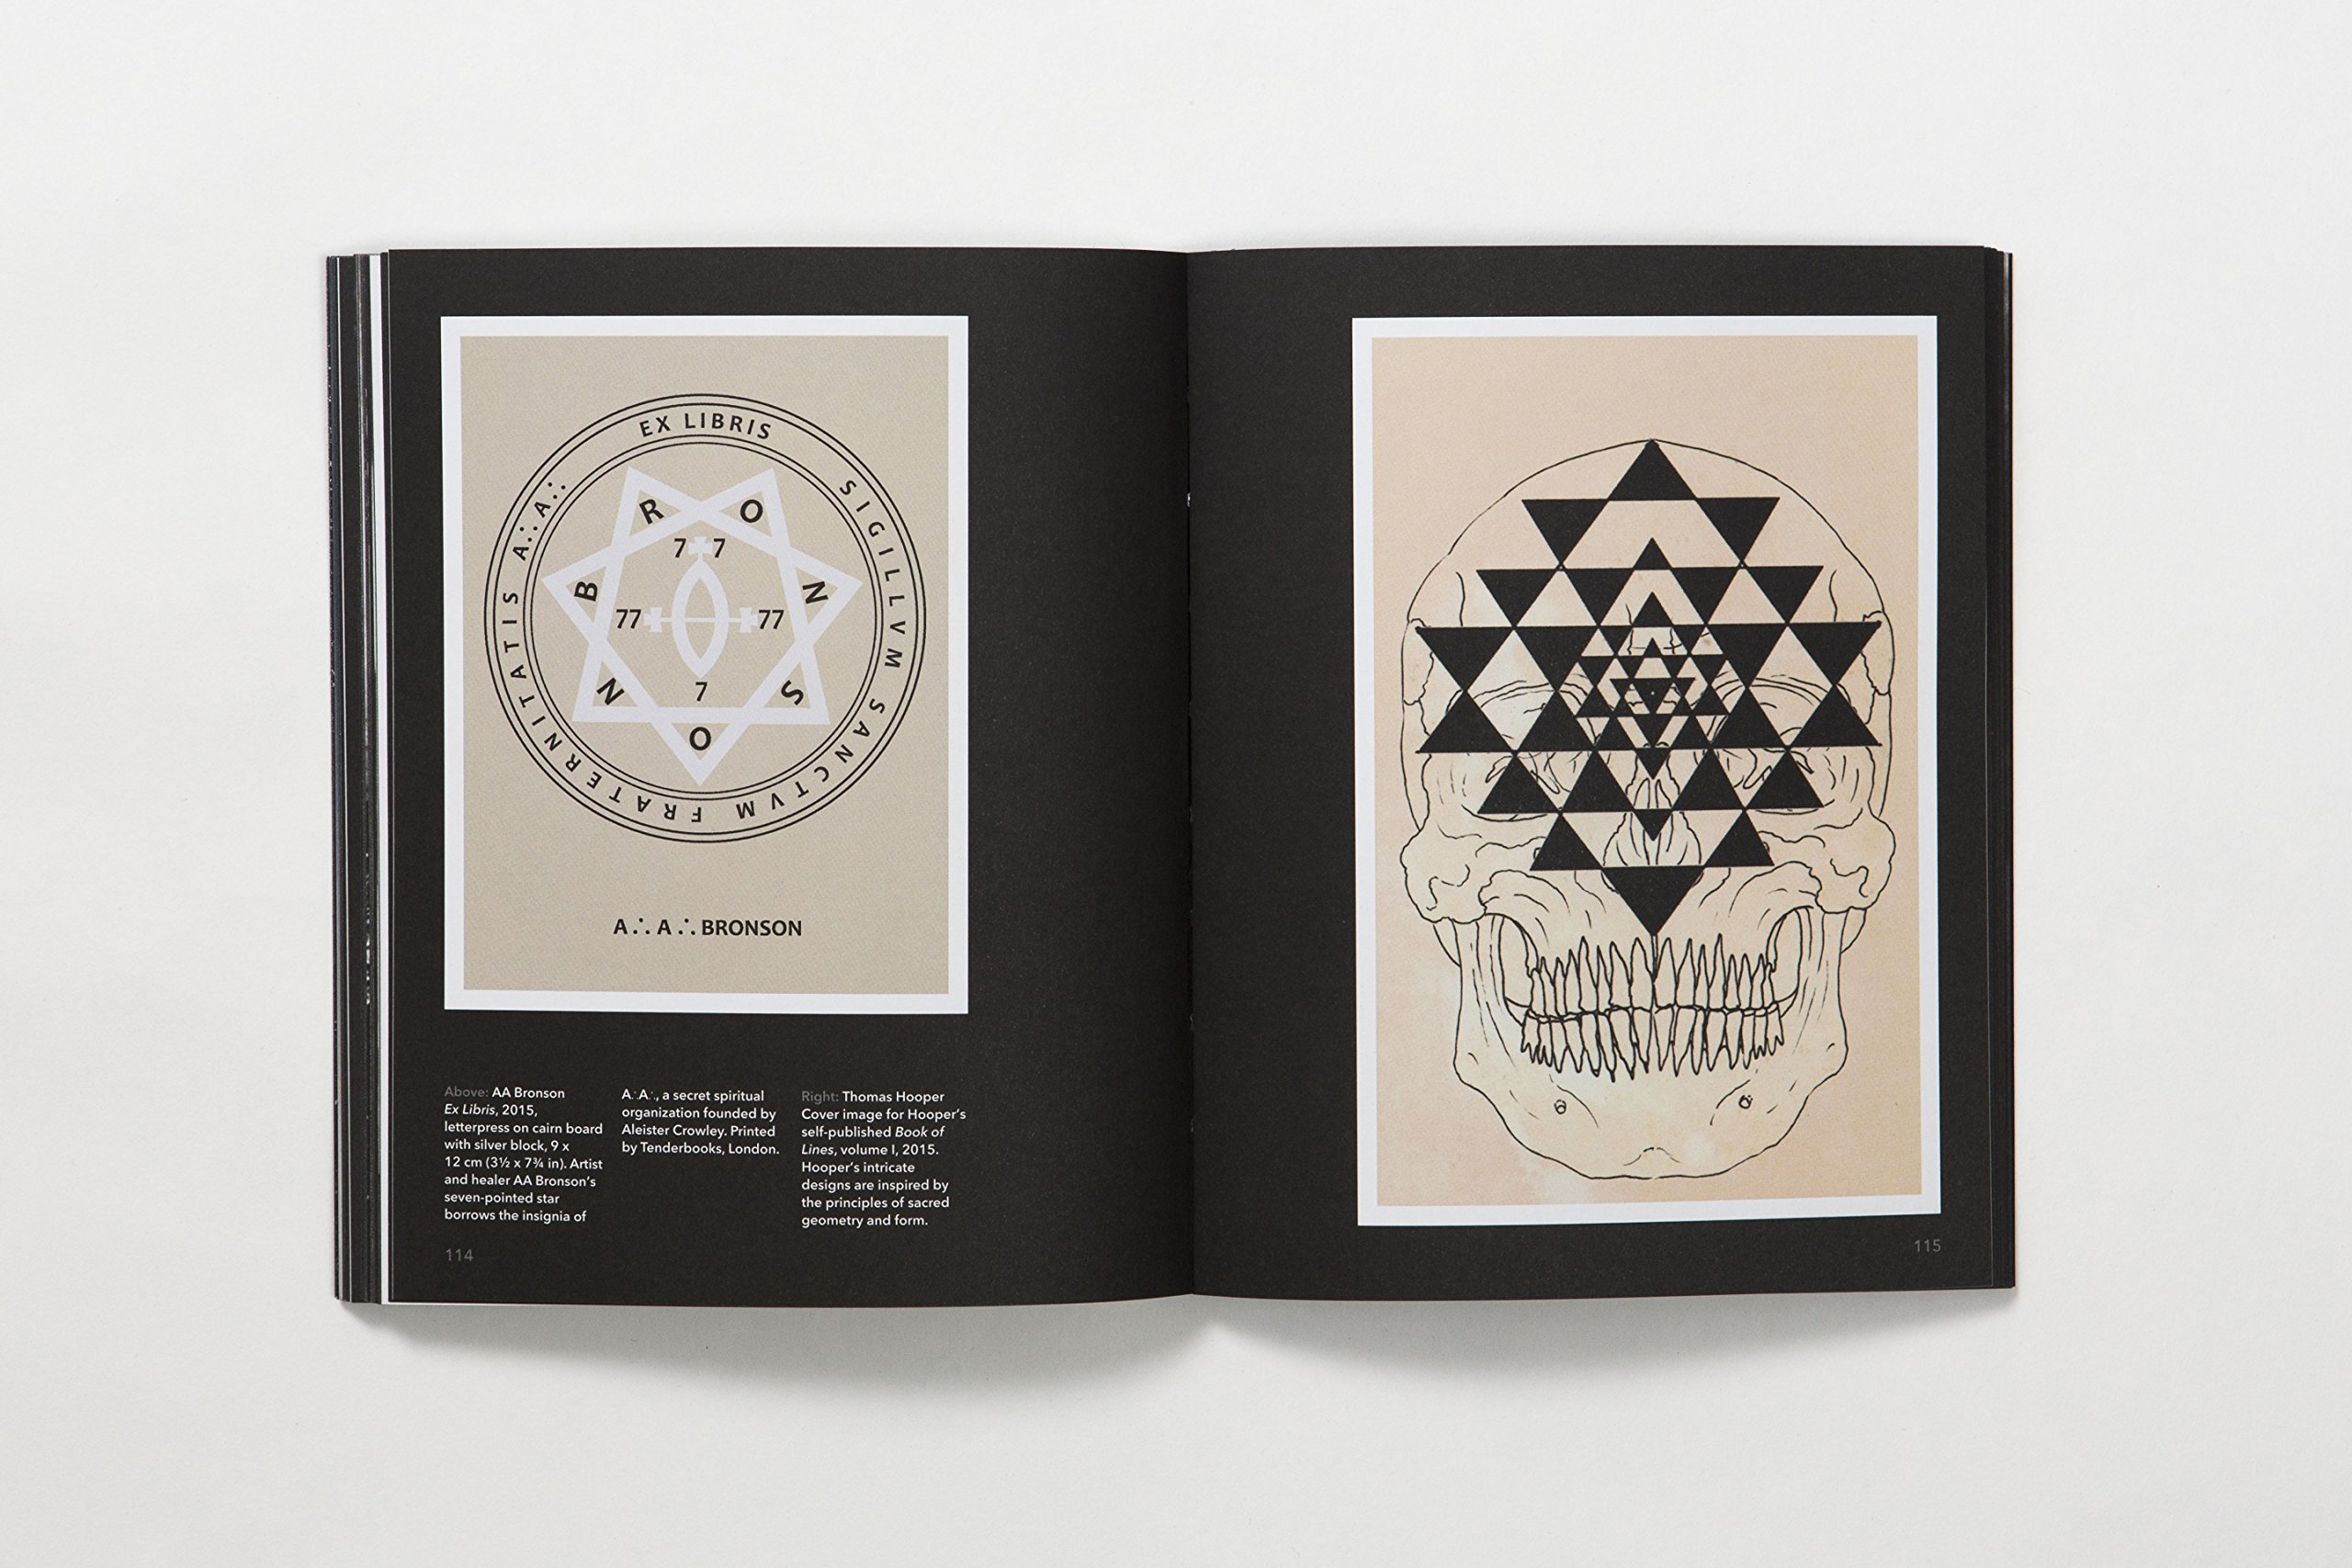 7 Principles Of Design In Art : The book of black: faye dowling: 9781786270429: amazon.com: books